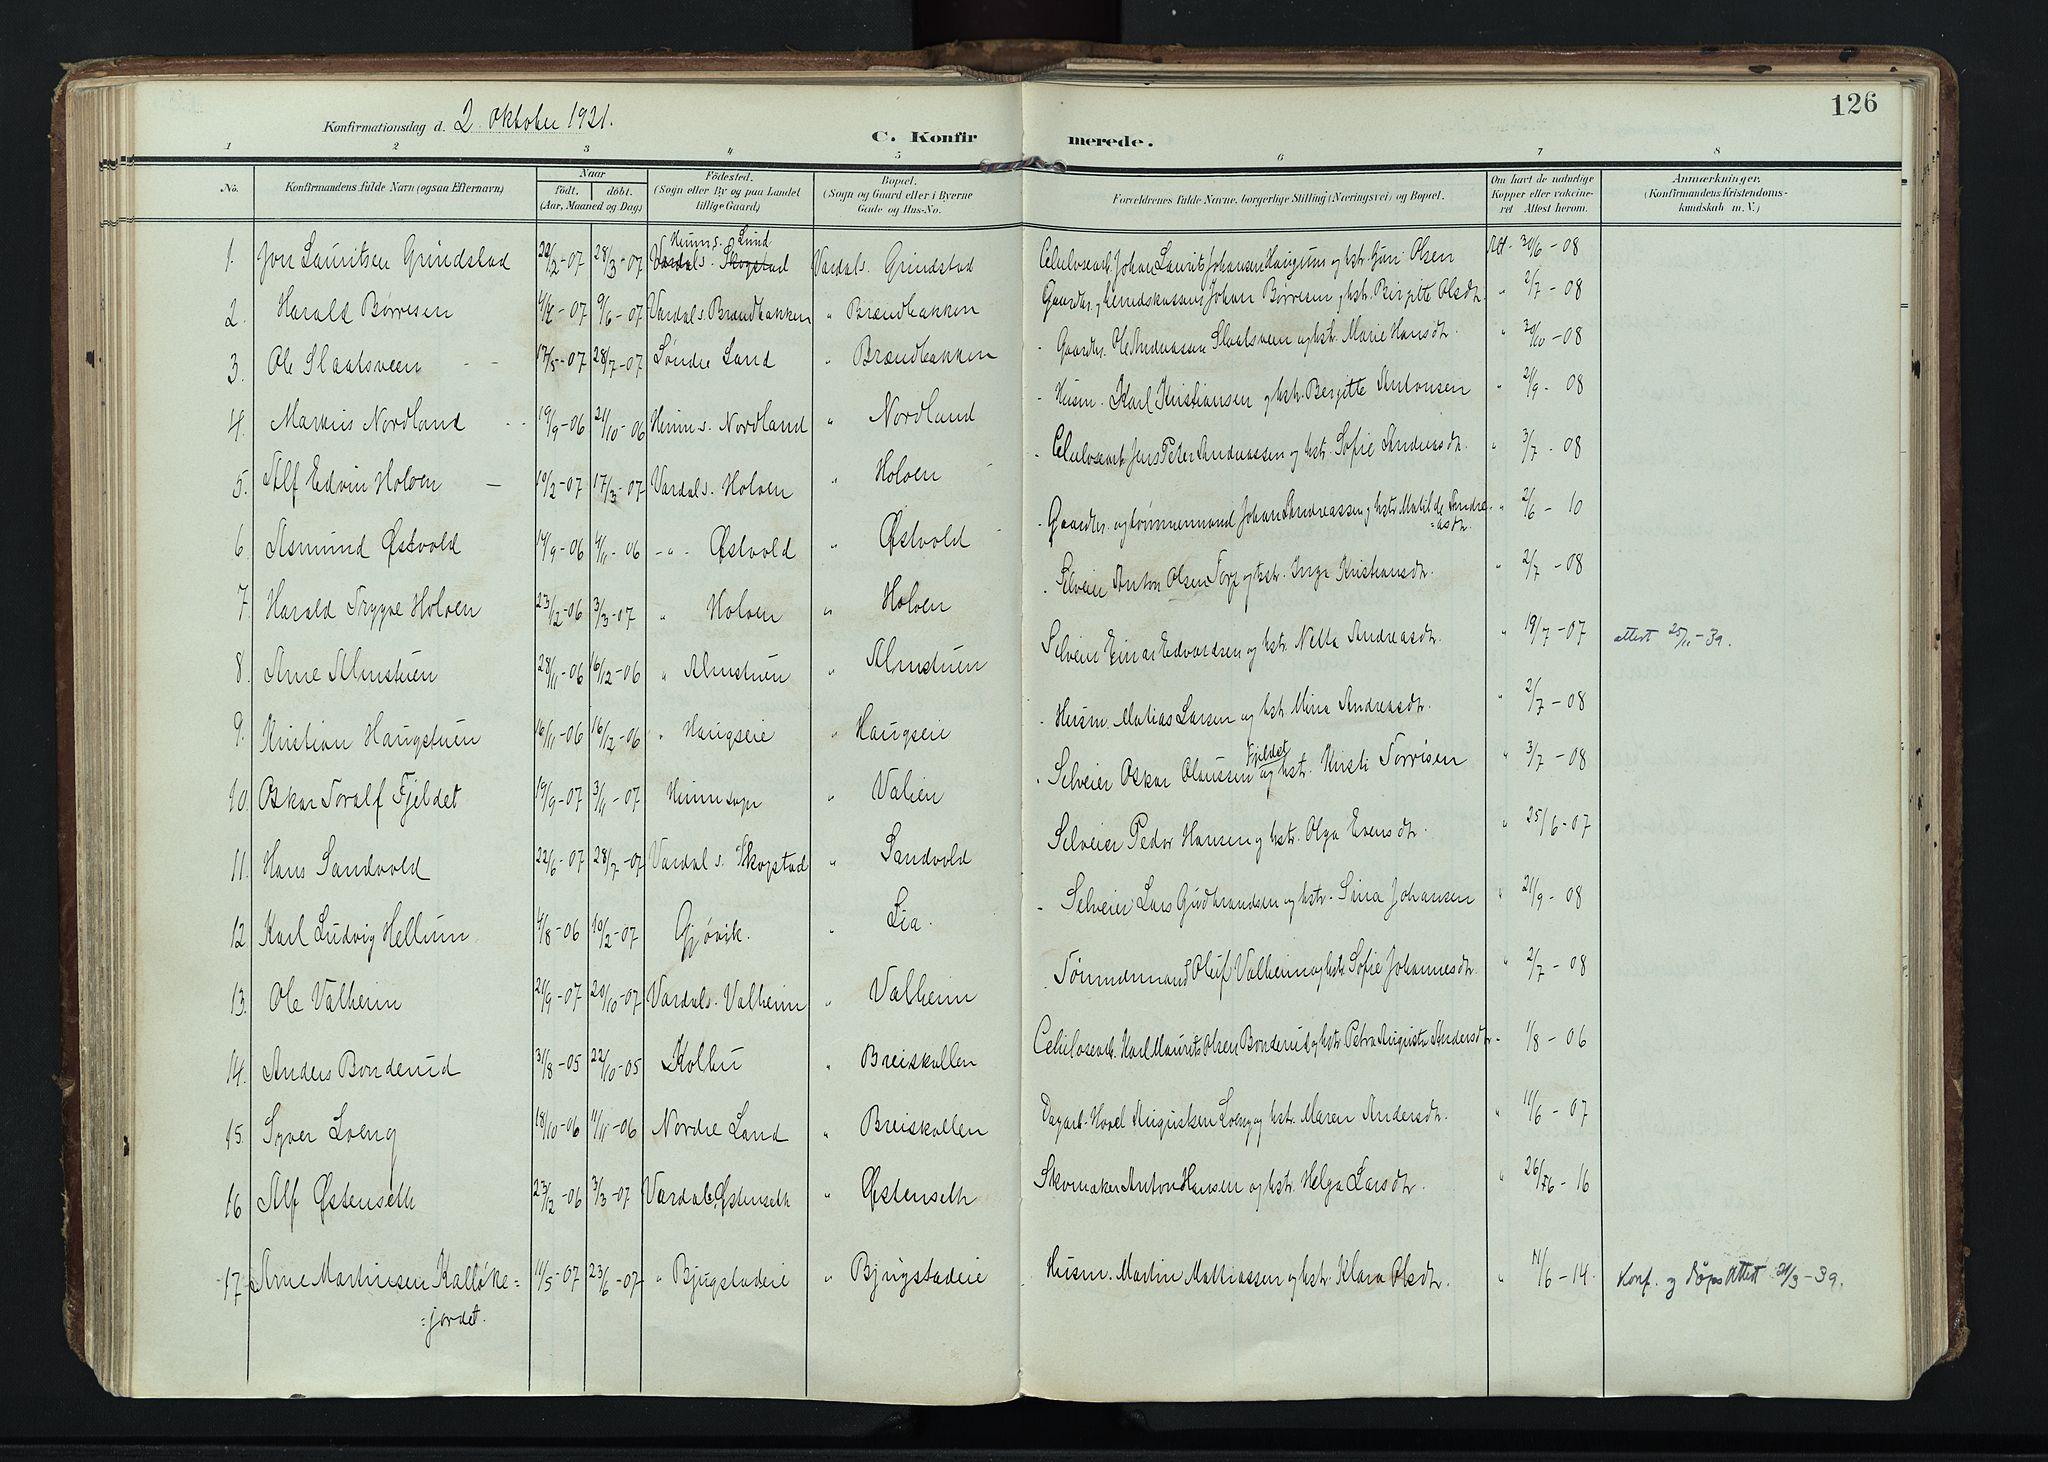 SAH, Vardal prestekontor, H/Ha/Haa/L0020: Ministerialbok nr. 20, 1907-1921, s. 126